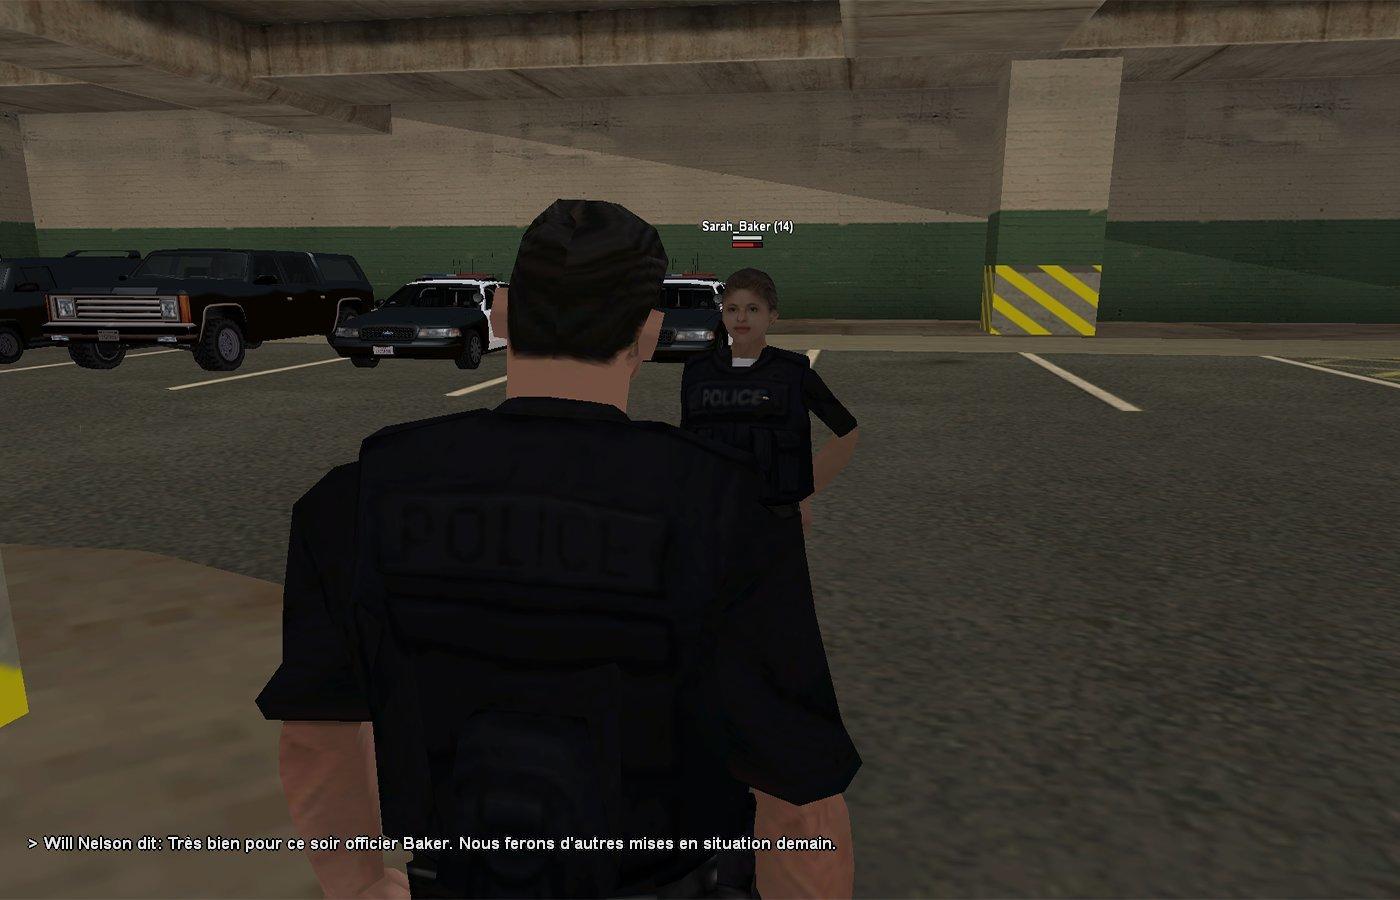 Los Santos Police Département #toprotectandtoserve (Part VI) - Page 3 1604446489-screen7